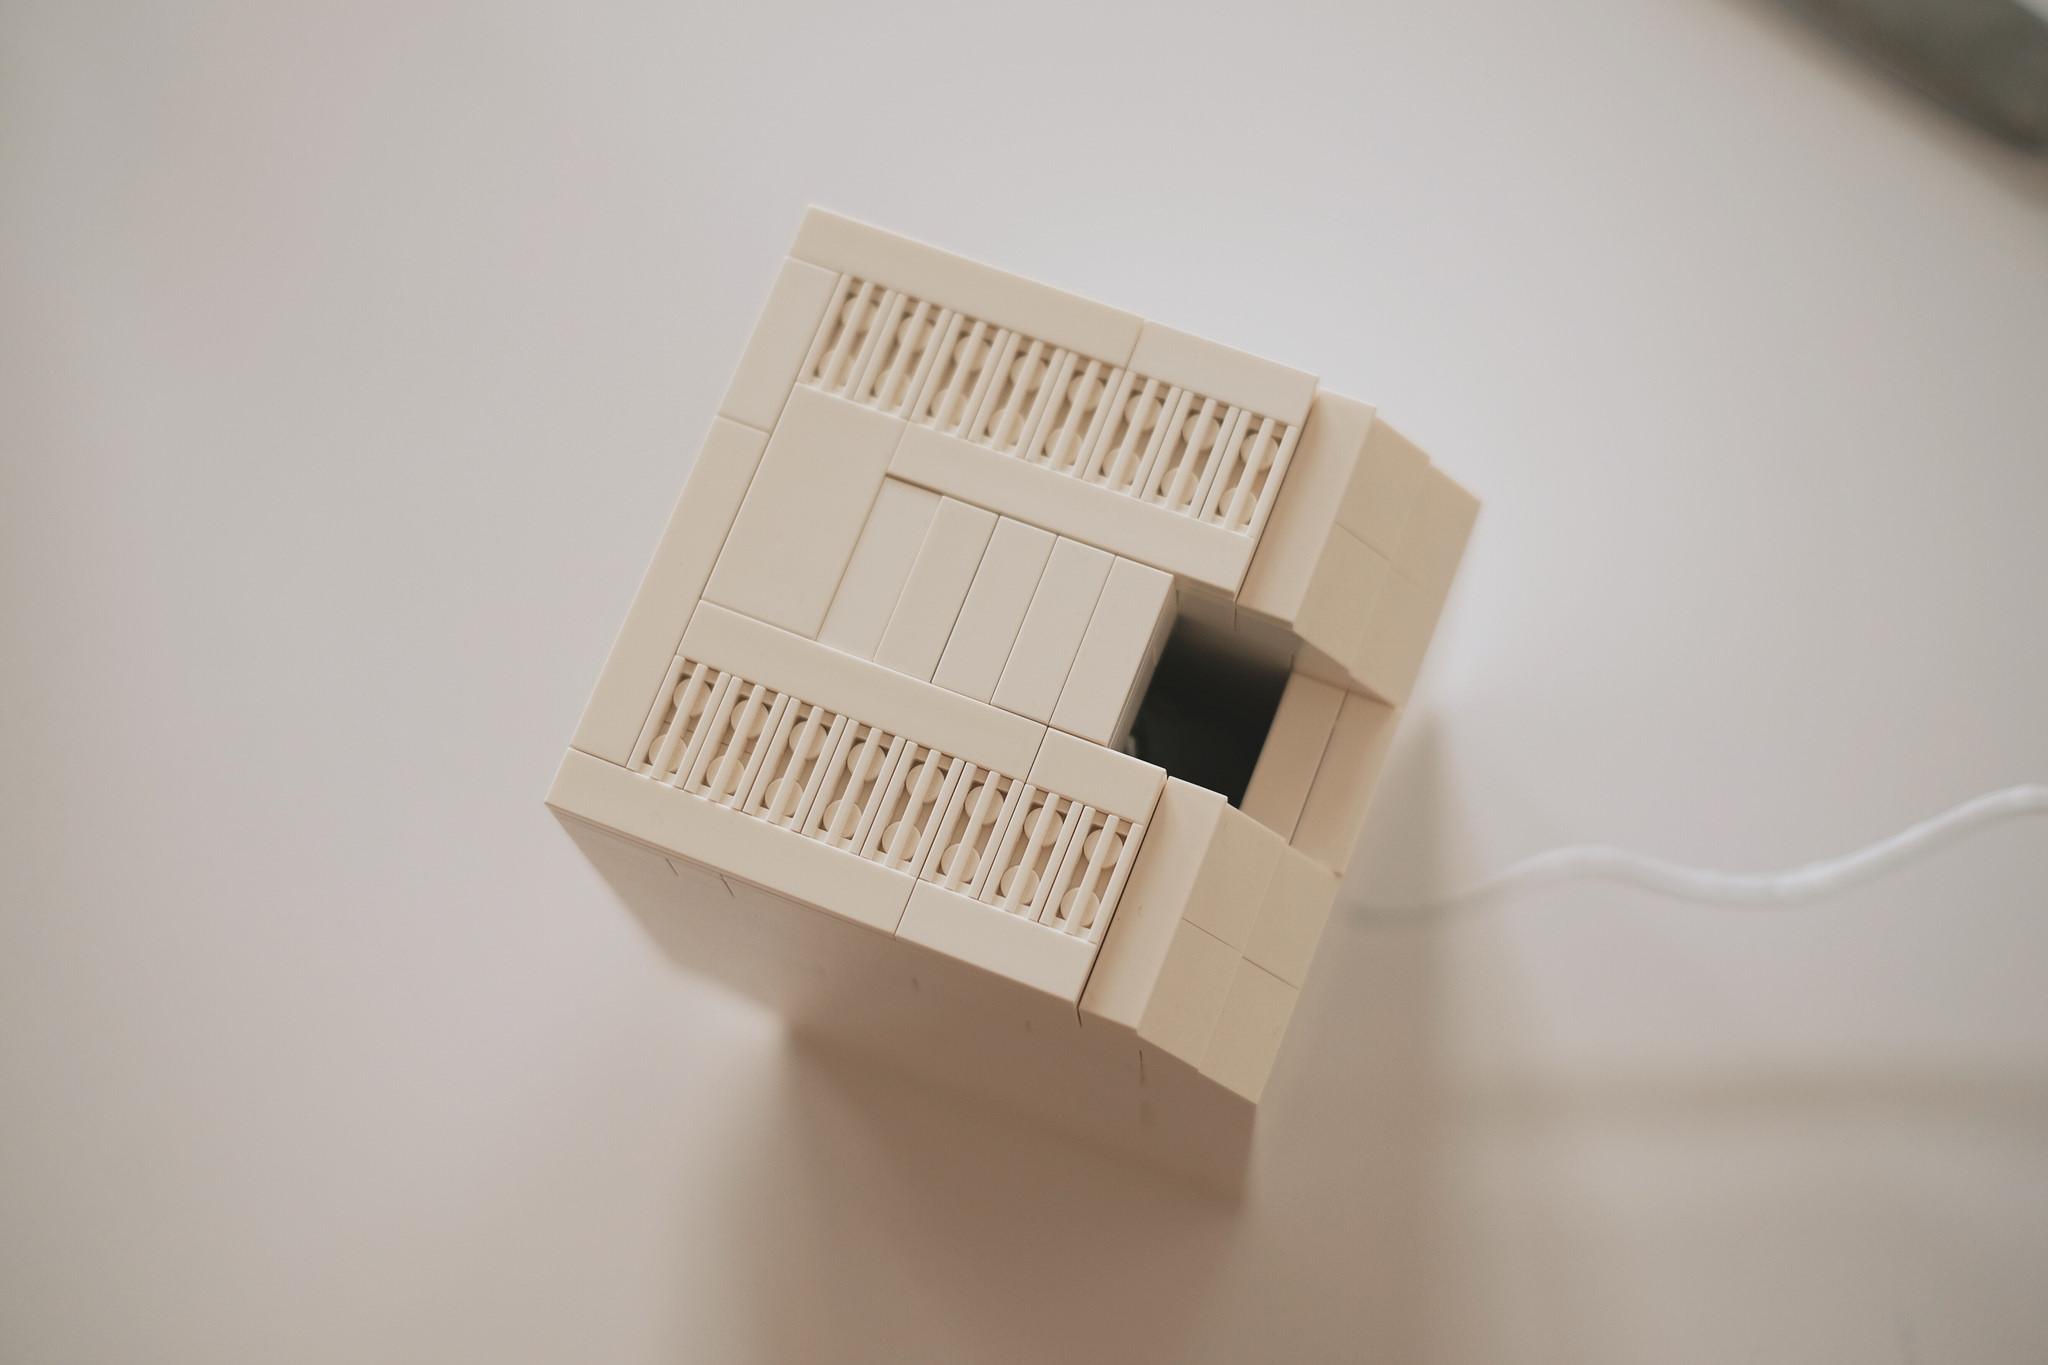 lego-mac-classic-003